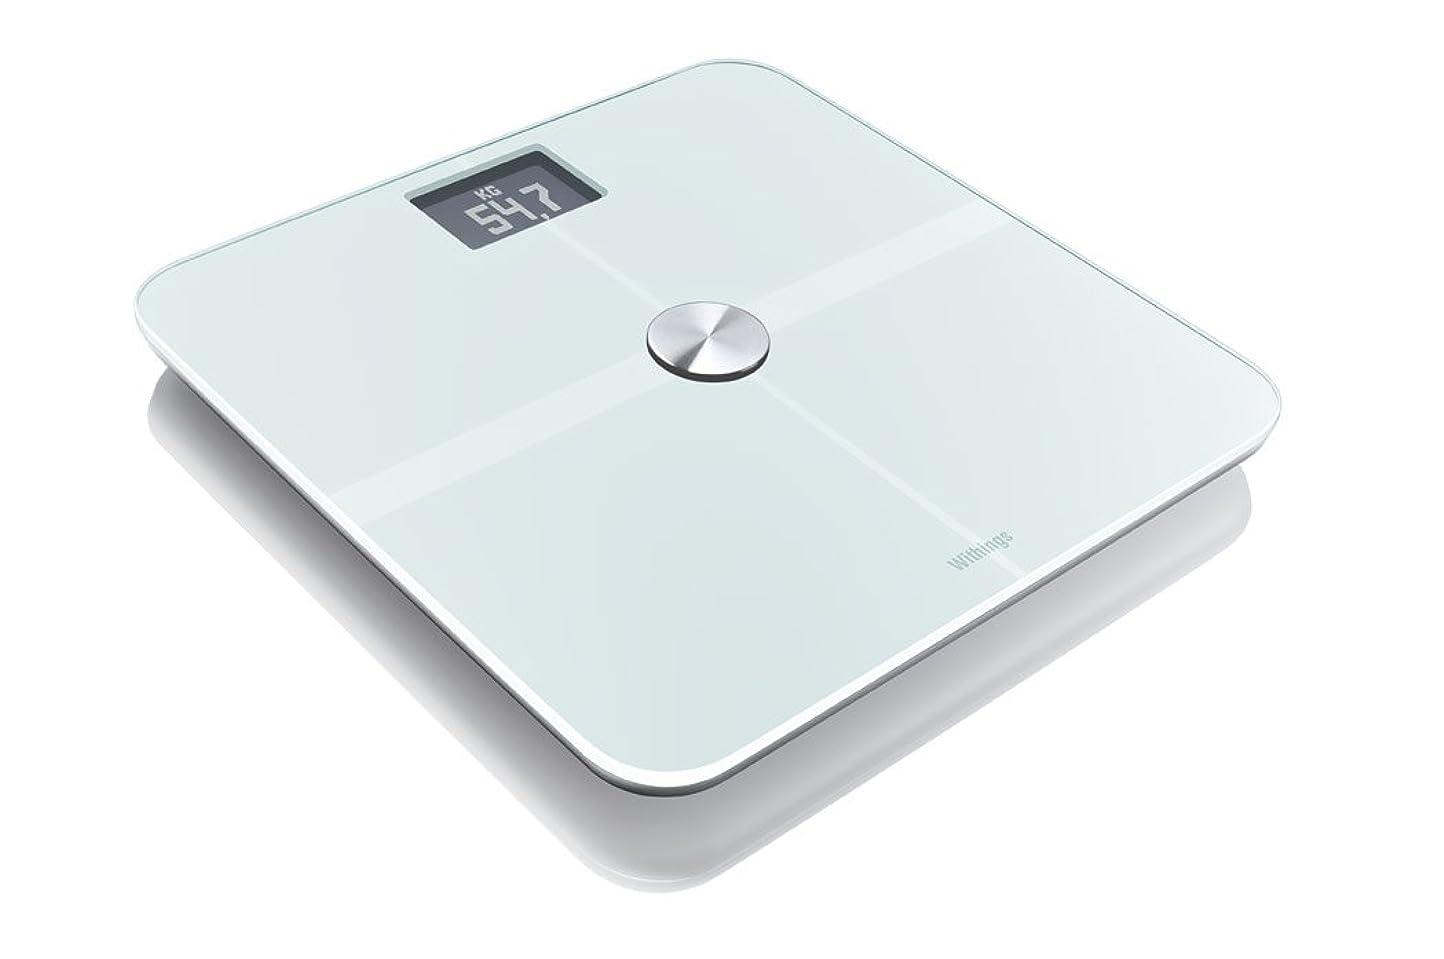 Covia ネットワーク対応 超薄型多機能体重計 <WiFi Body Scale> ホワイト twitter連動機能 データ自動記録 WBS01-W